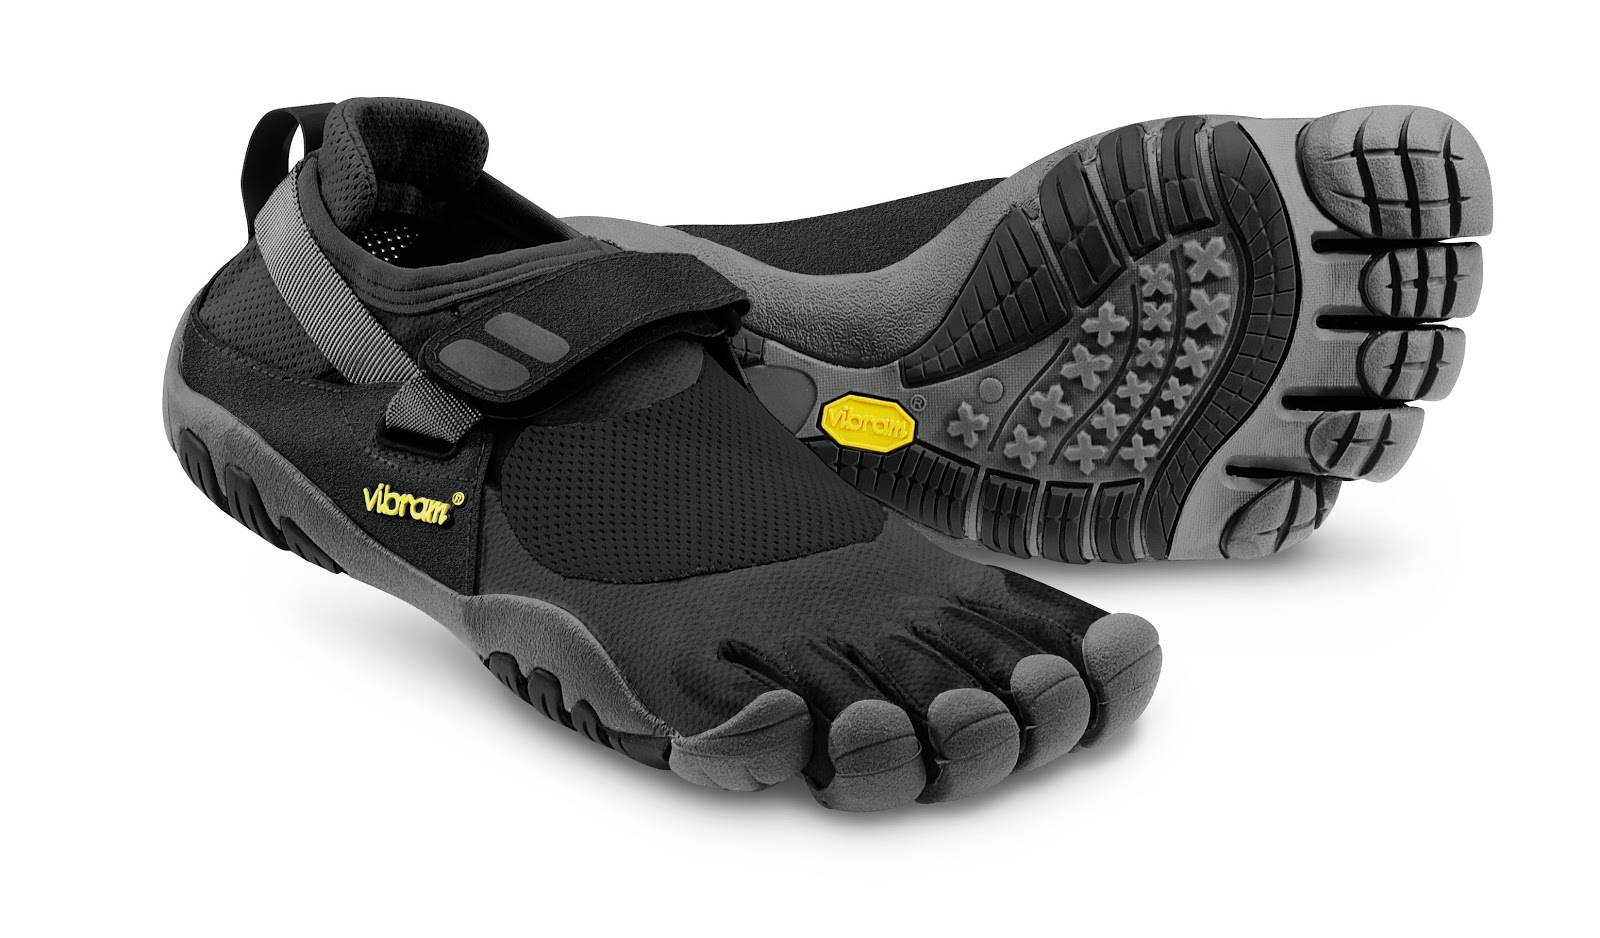 Adidas Five Fingers Shoes Uk